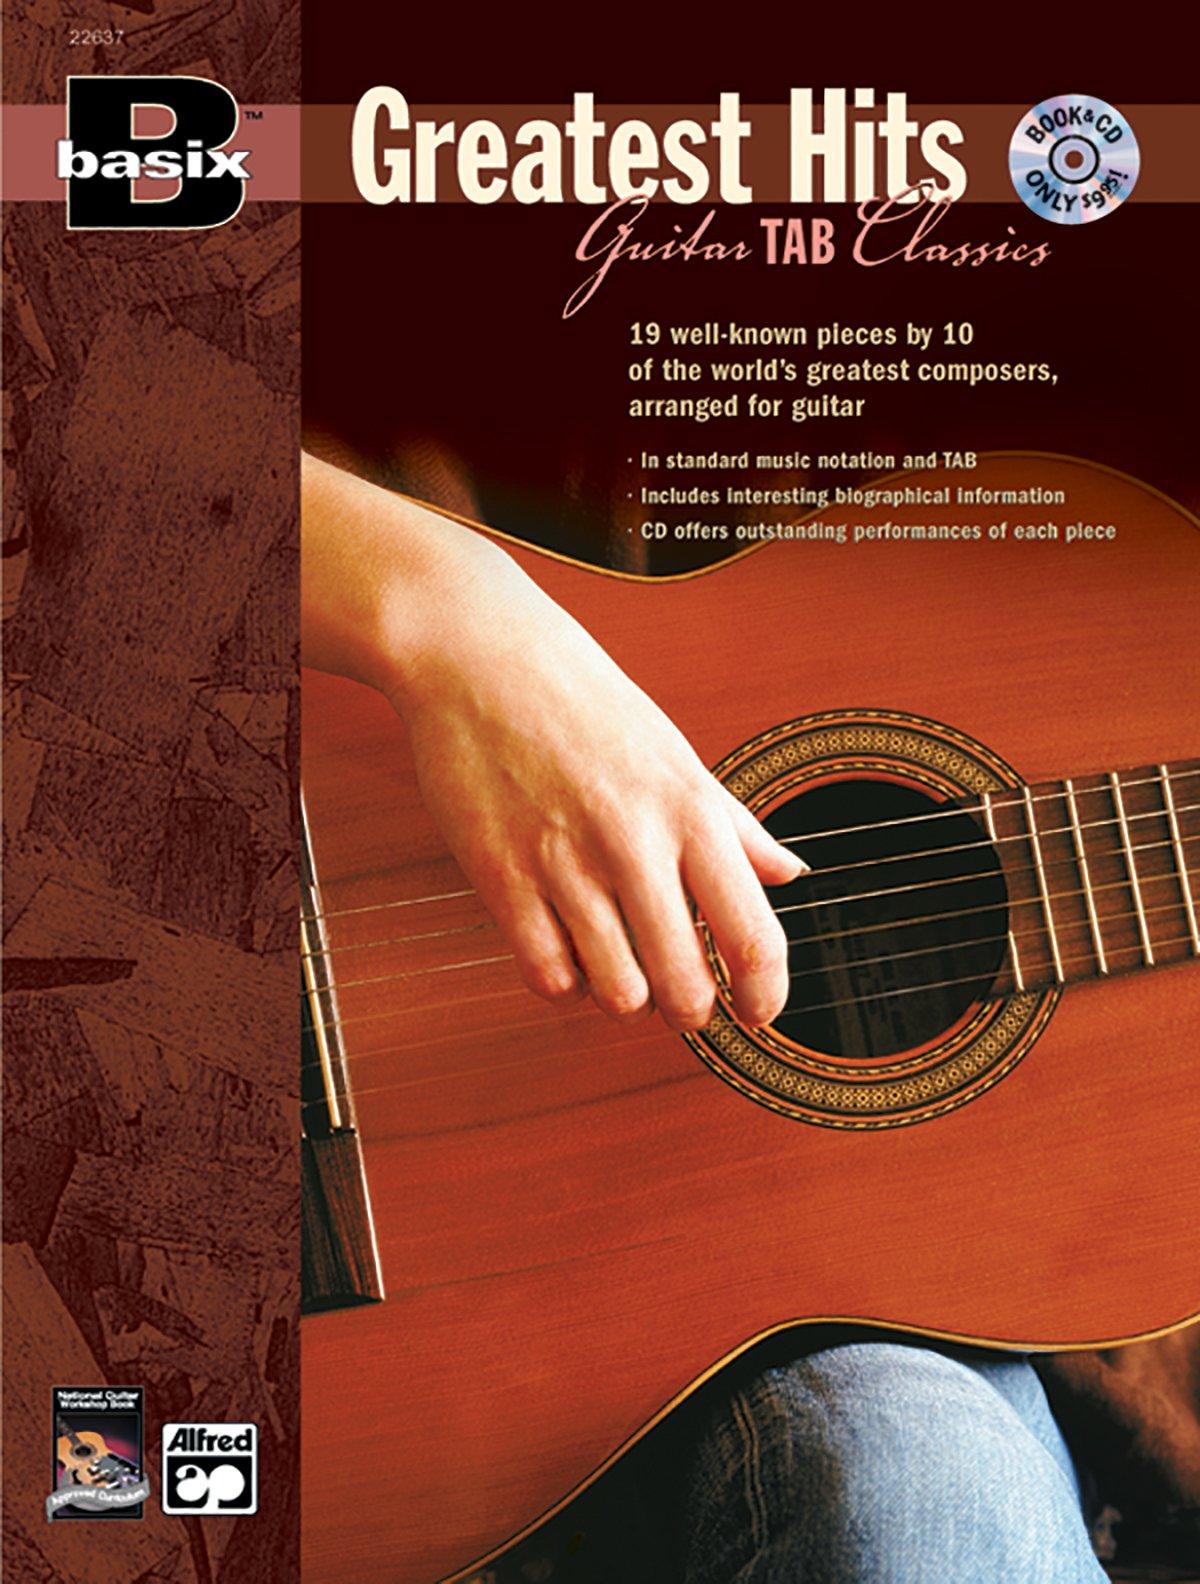 Basix Greatest Hits Guitar Tab Classics (Basix(R) Series)